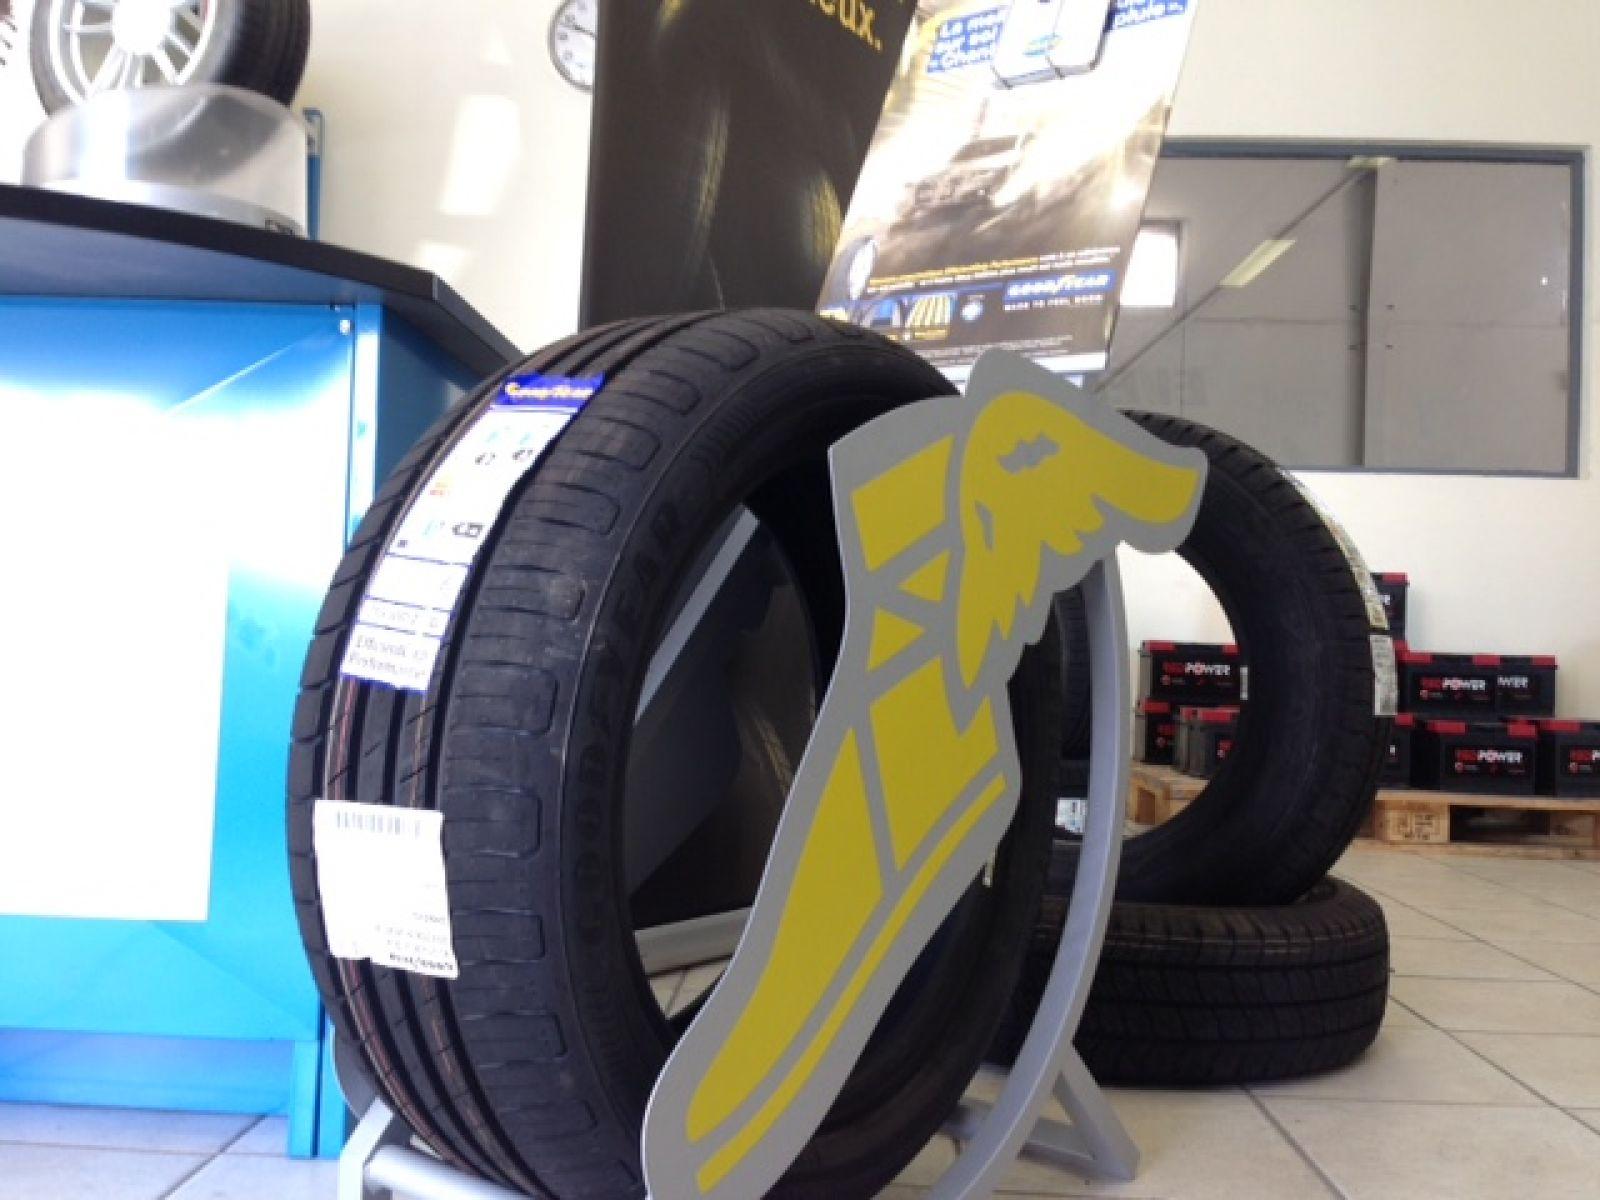 Vente et pose de pneus la valette du var garage et for Garage pose pneu